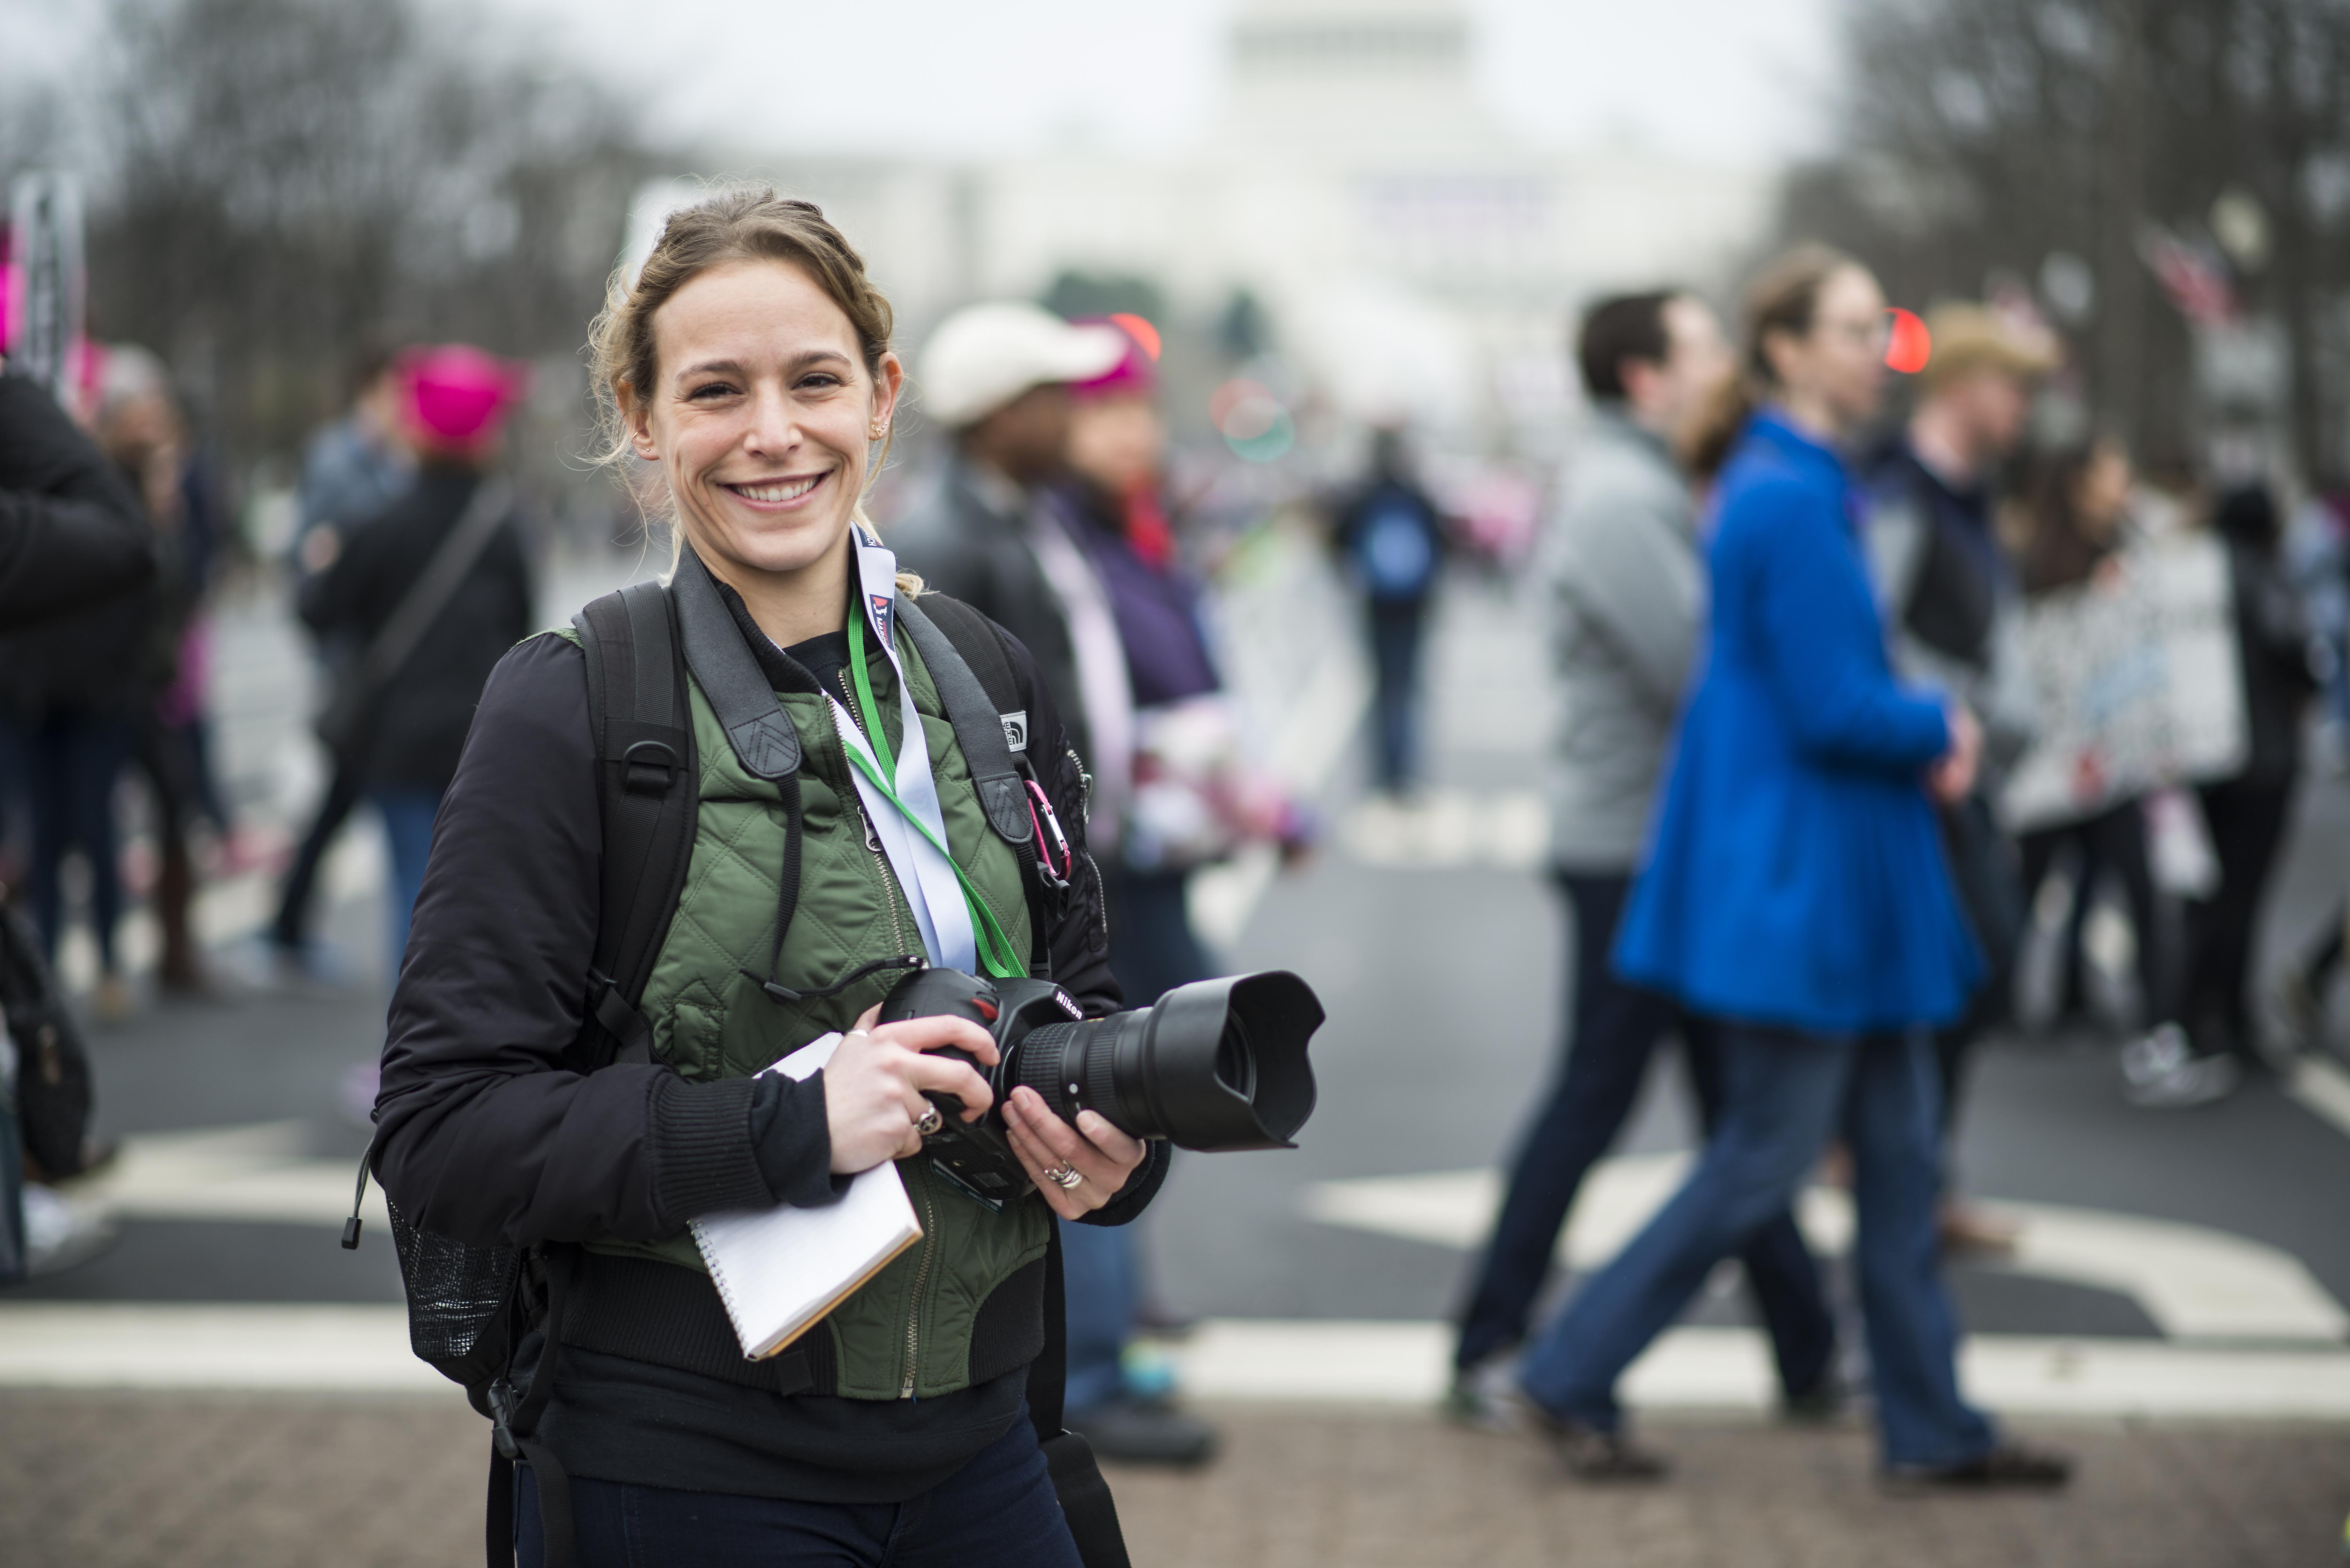 Alanna Vagianos covered the Women's March on Washington on Saturday, Jan. 21, 2017.